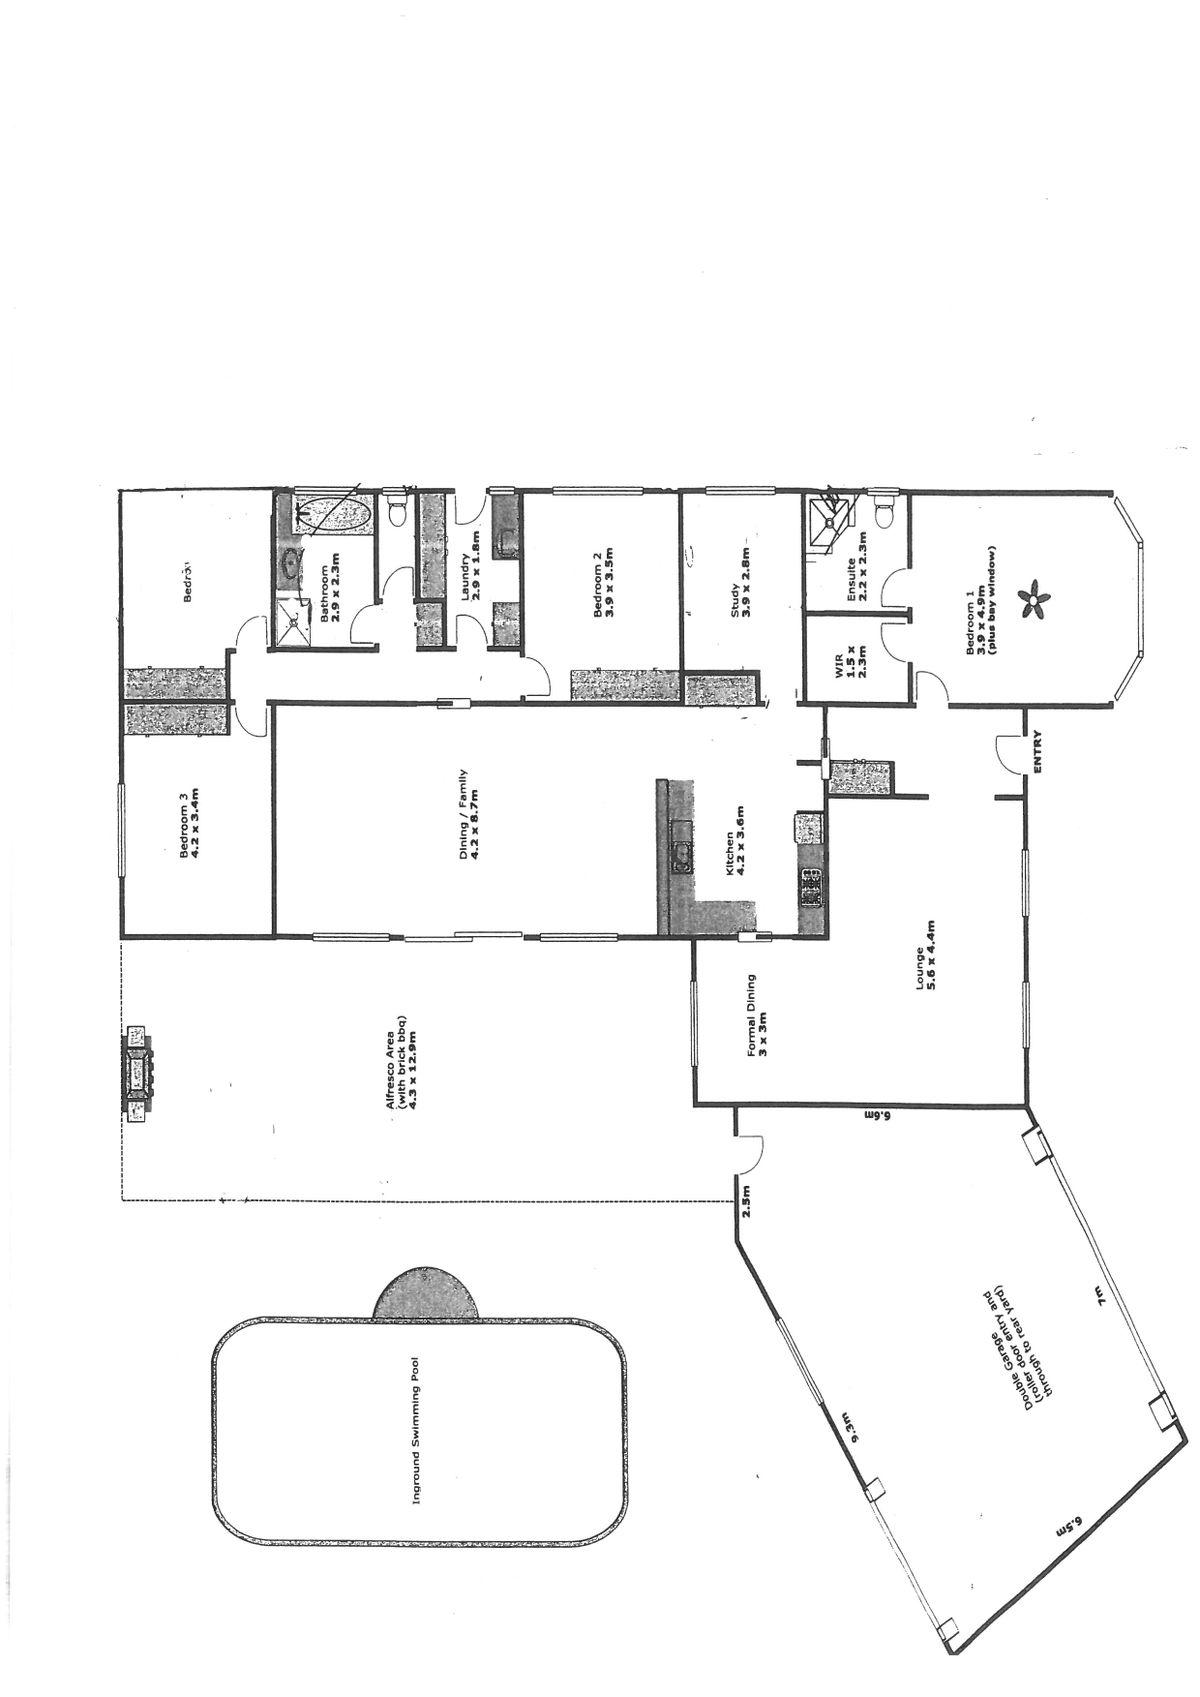 16 Nabila Court, Mildura, VIC 3500